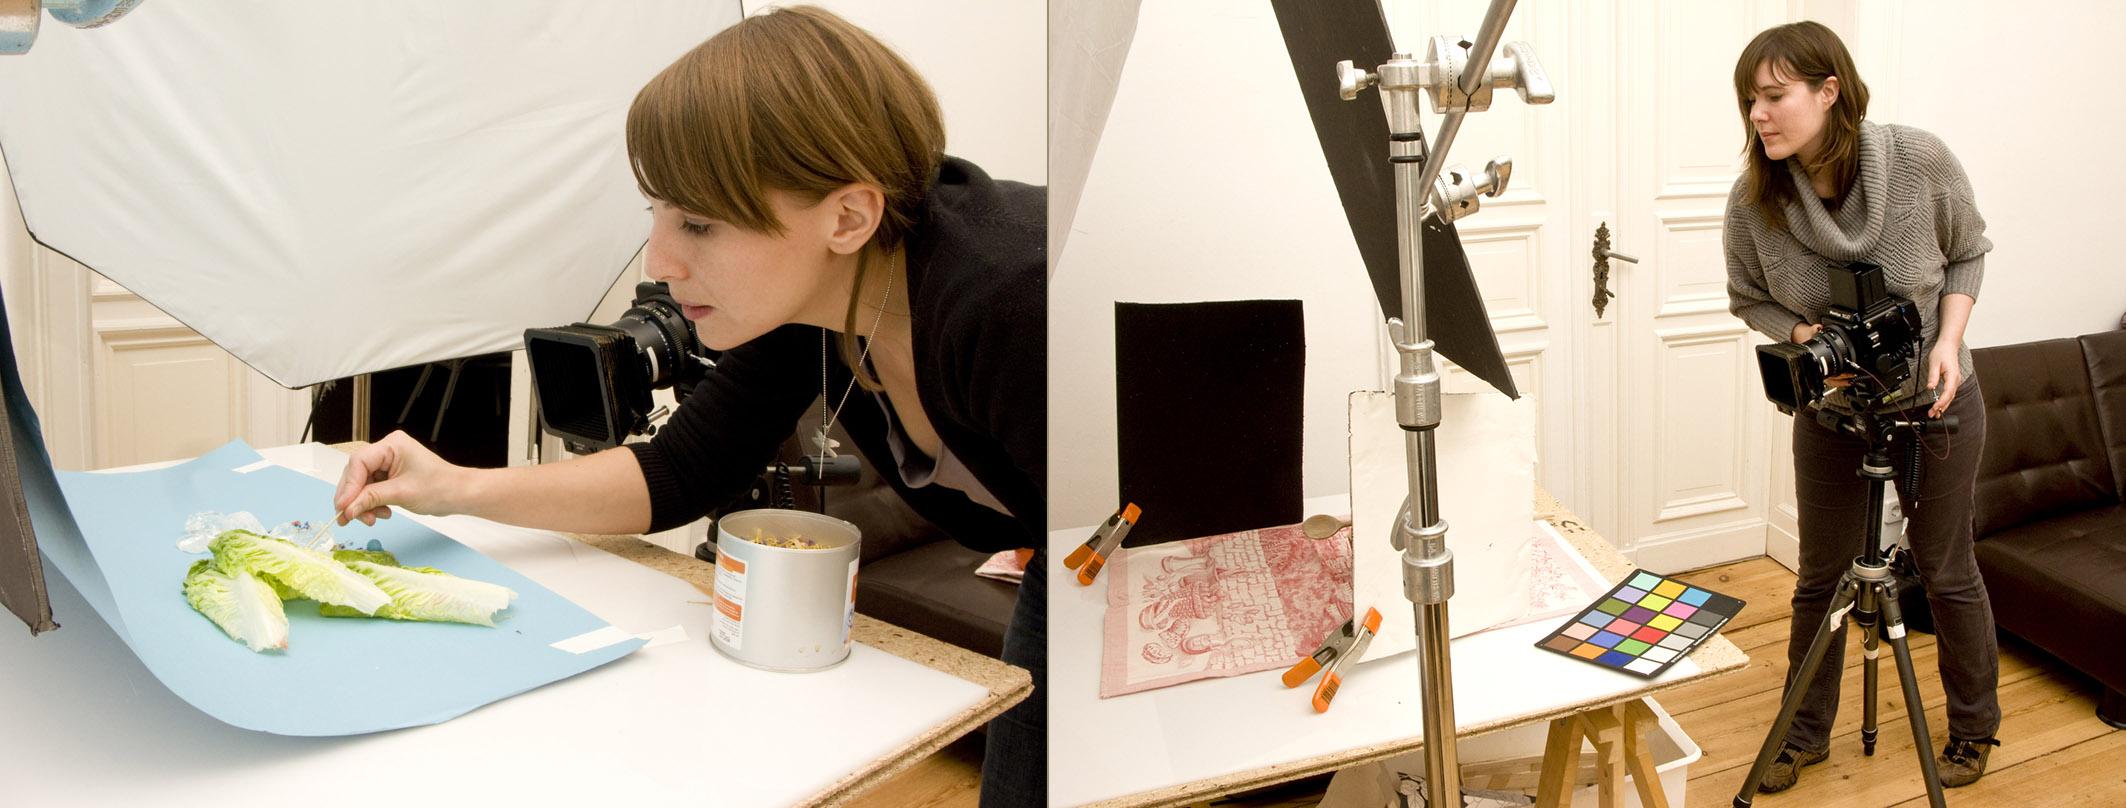 Photographers Meike Bergmann (left) and Judith Keller preparing shots for 'Das Klima Kochbuch' - respectively by Meike Bergmann and Judith Keller.